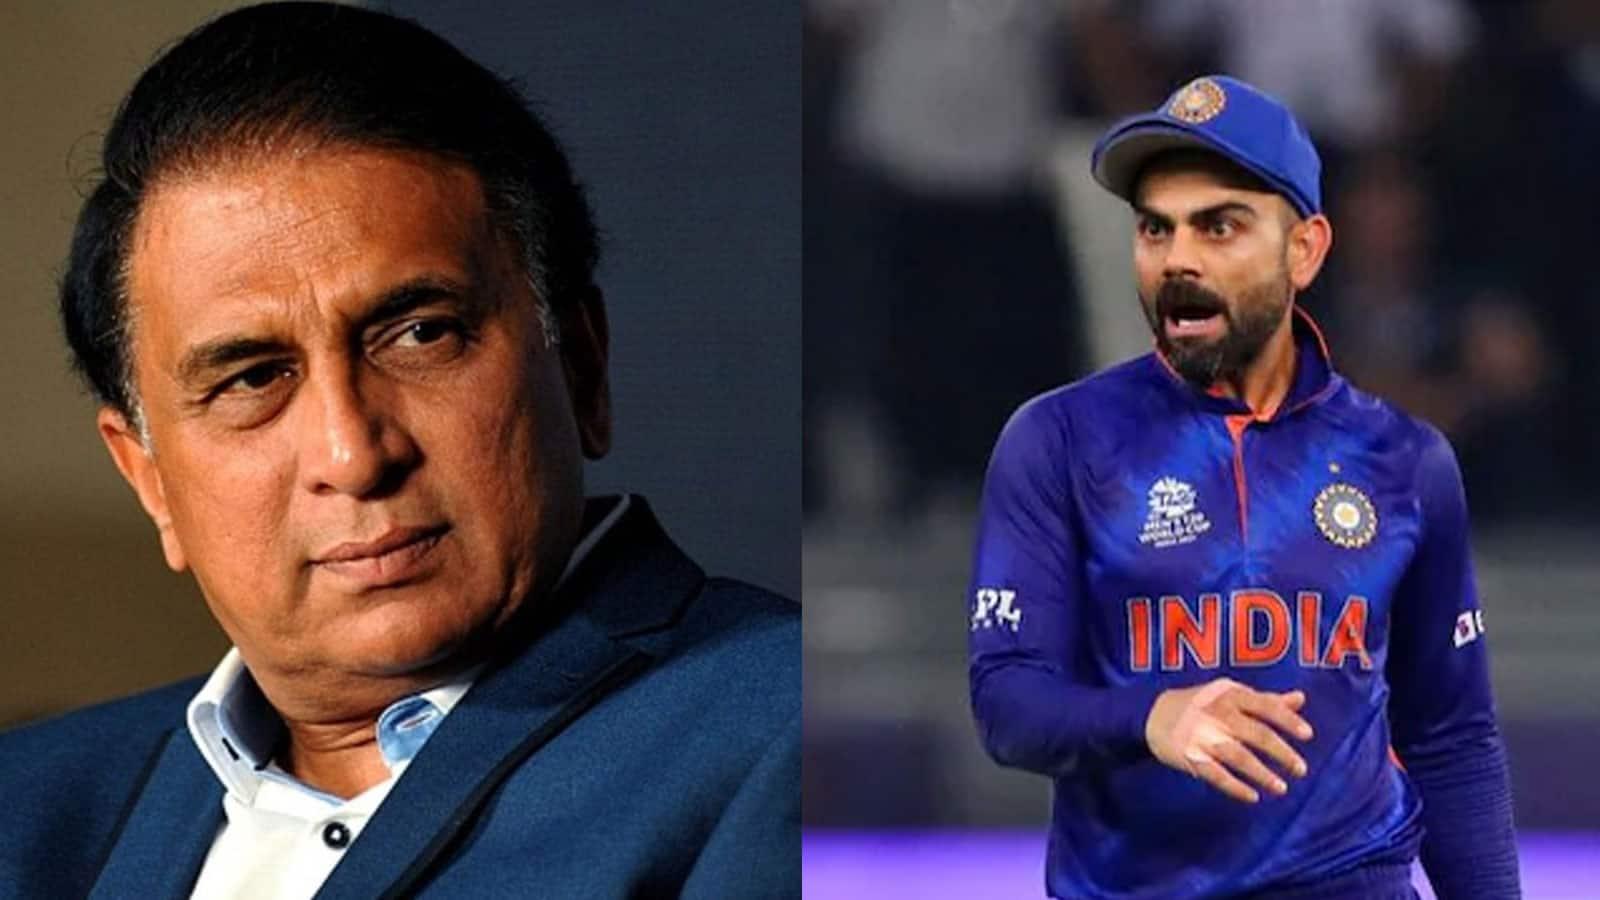 T20 World Cup 2021: 'Focus on next matches', Sunil Gavaskar tells Virat Kohli after India's crushing defeat to Pakistan thumbnail